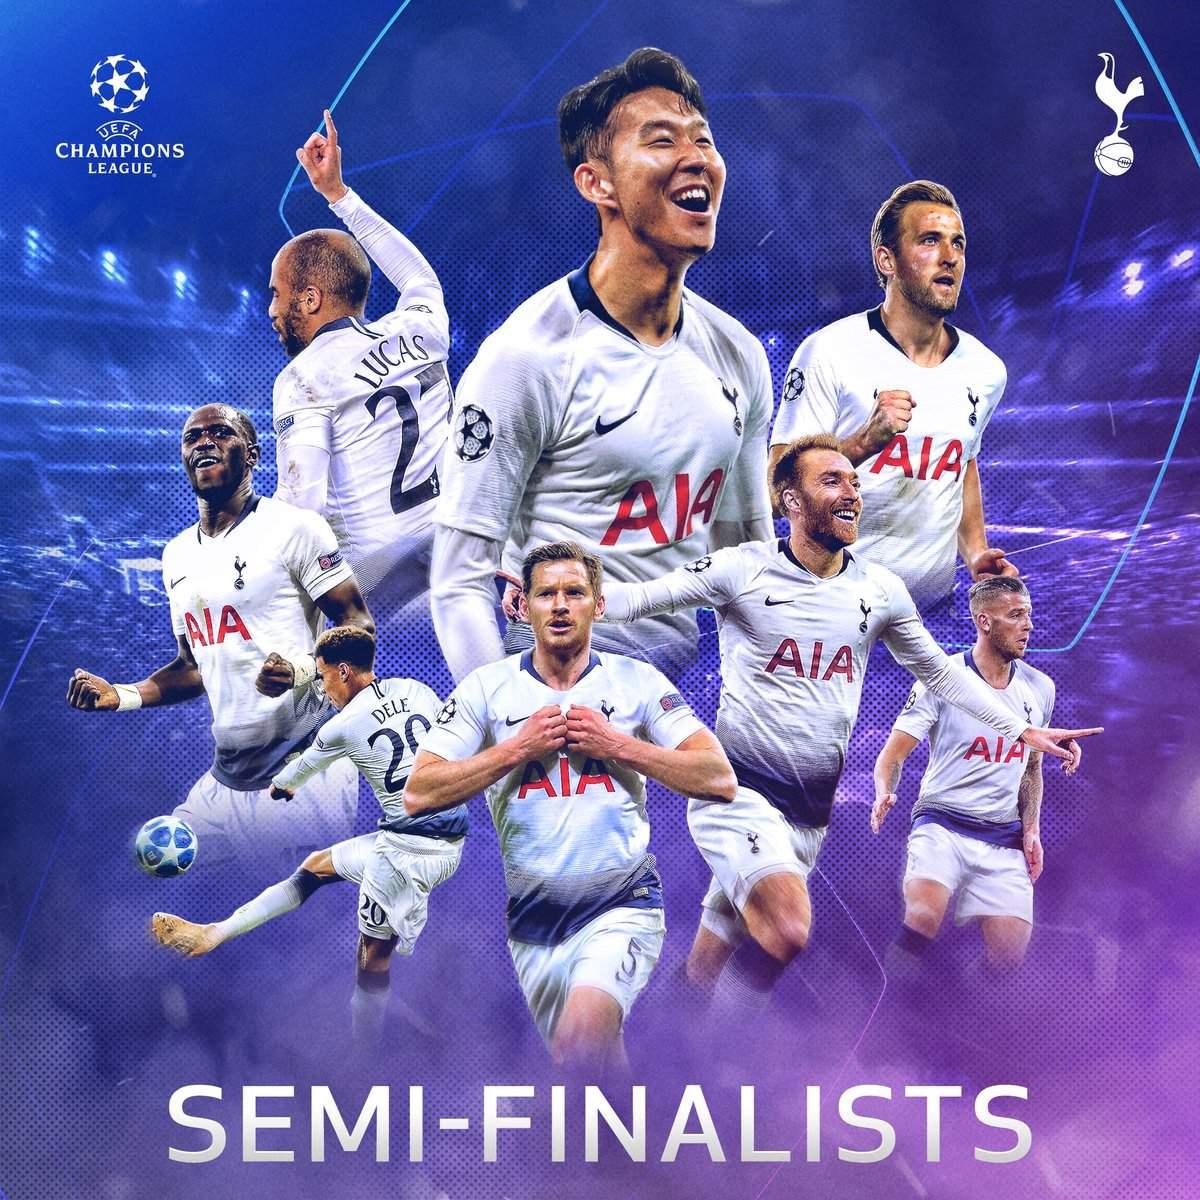 Champions League: vince il Manchester City 4-3 ma passa il Tottenham